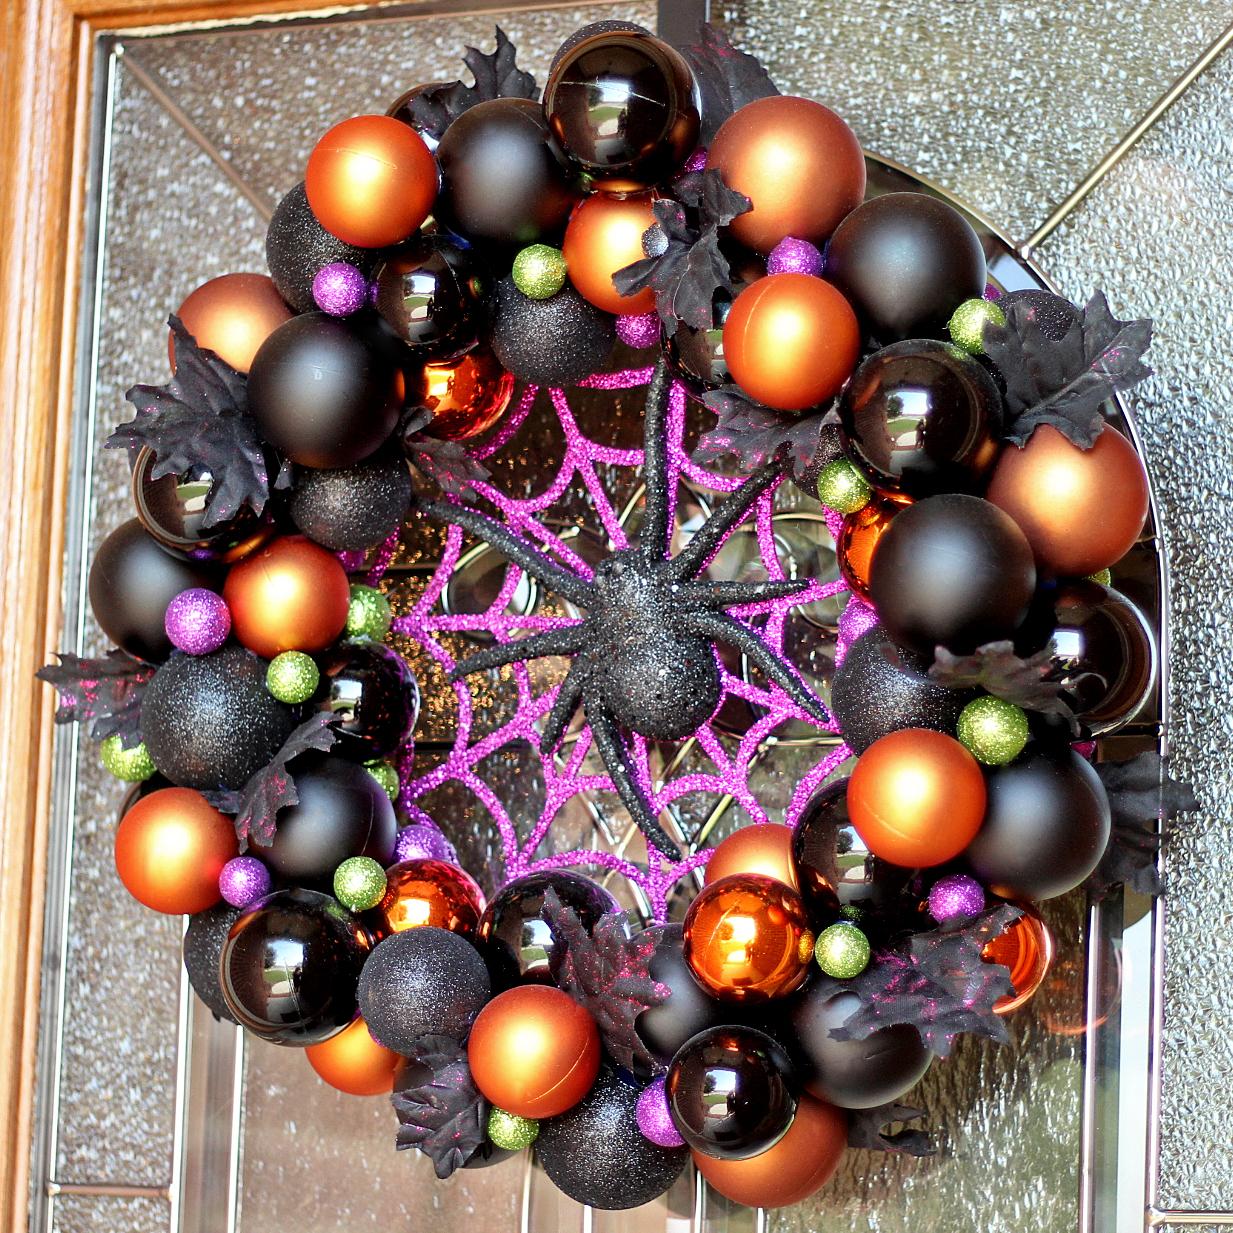 DIY Halloween Ornament Wreath | Where The Smiles Have Been #Halloween #ornaments #wreath #spider